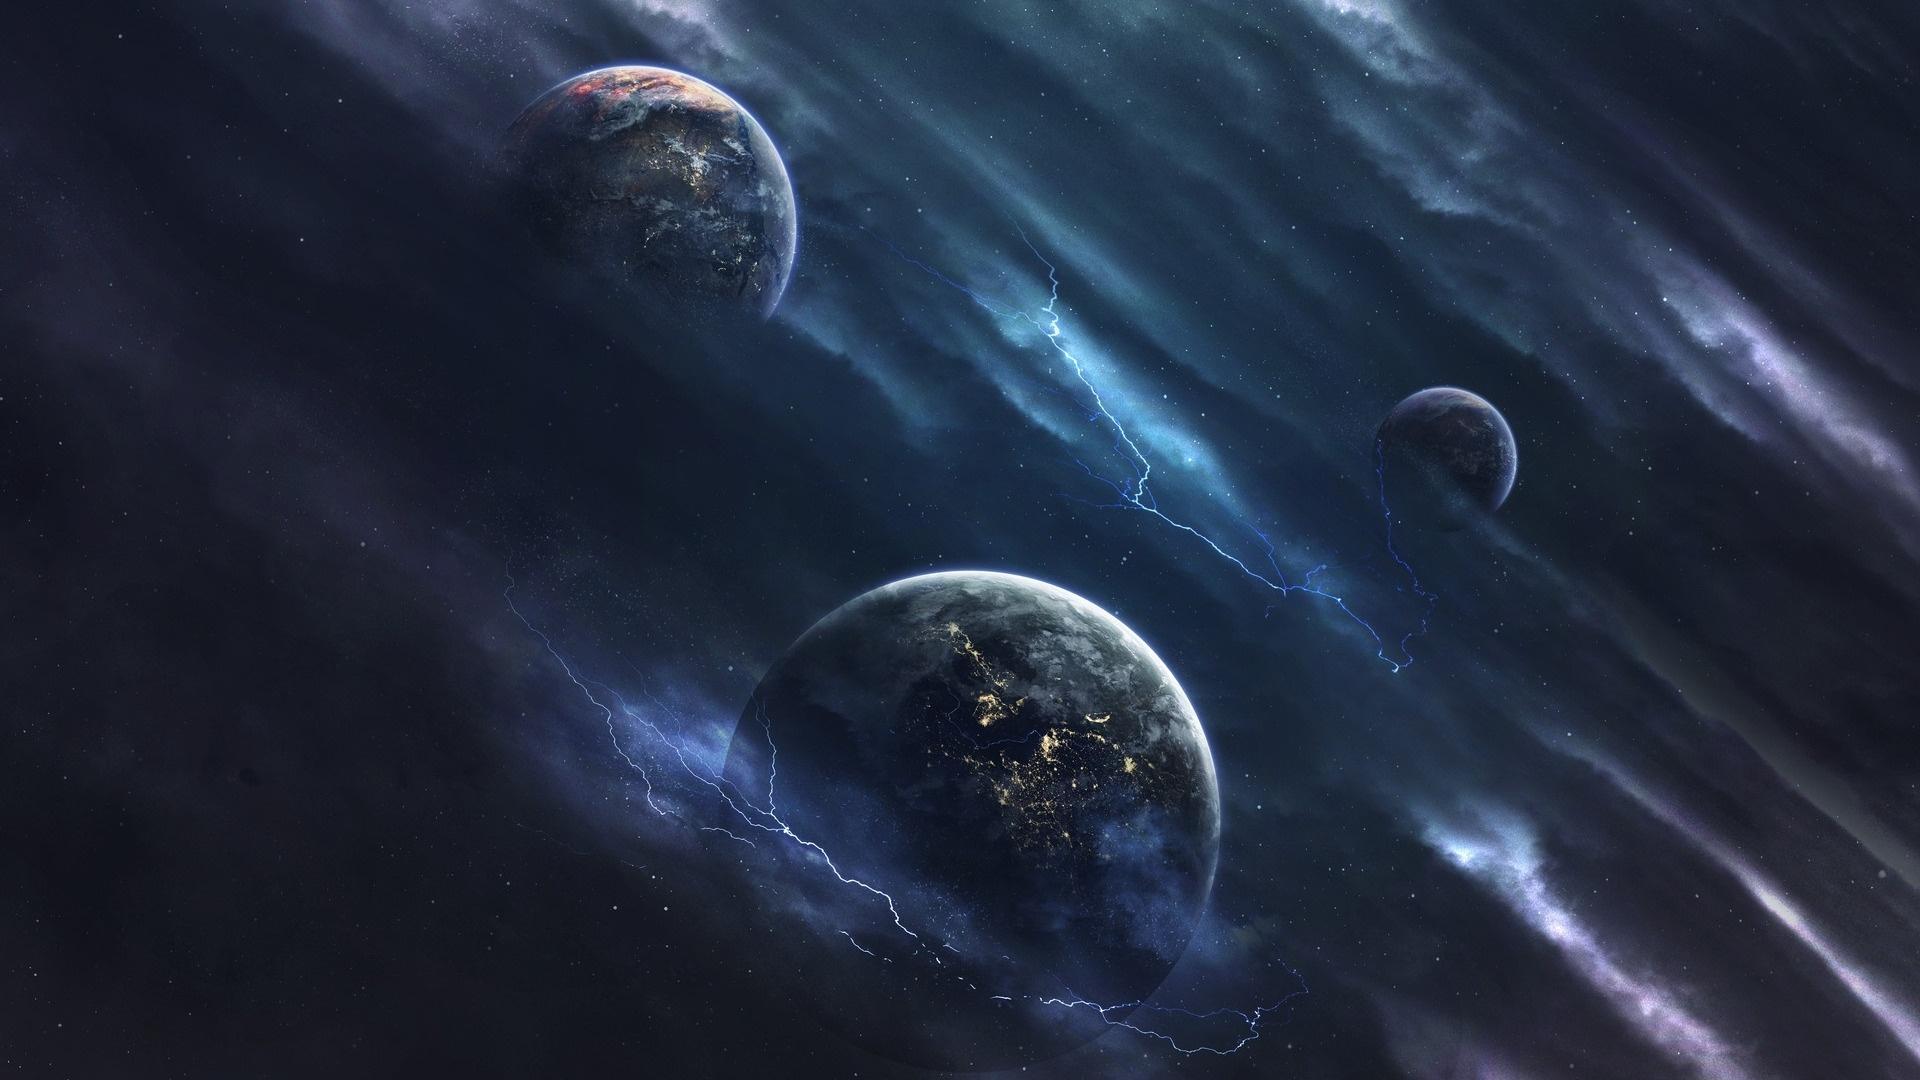 Alien Planet Art computer wallpaper